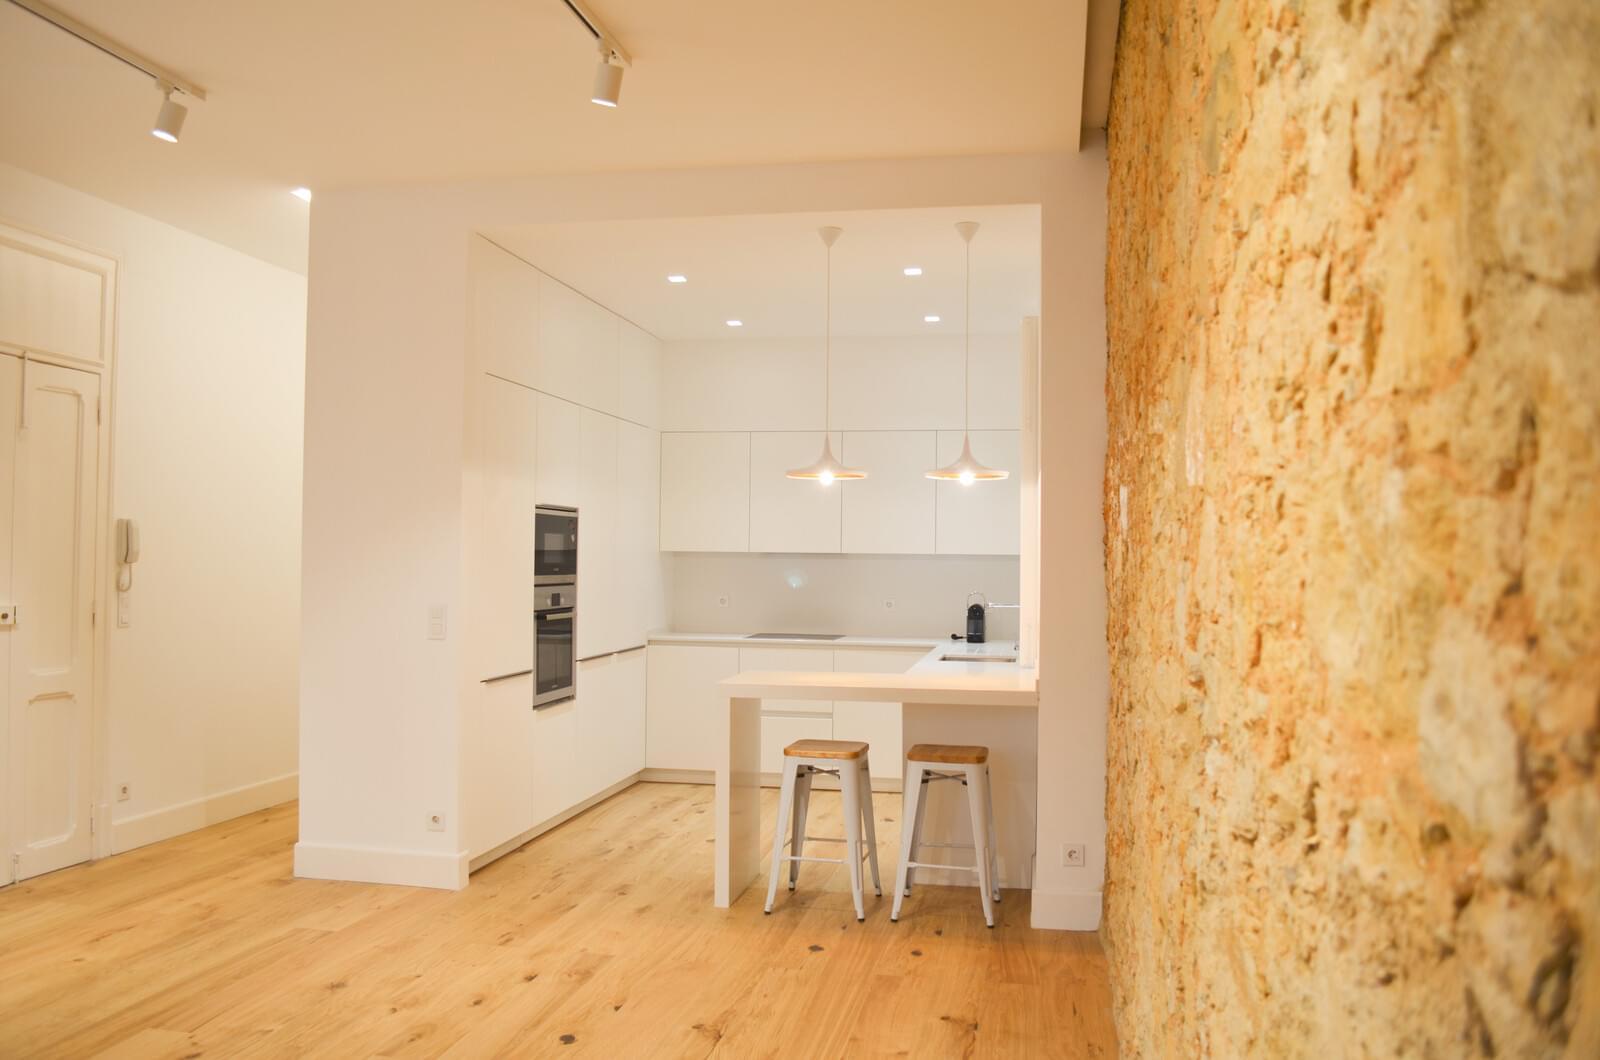 pf18801-apartamento-t2-lisboa-509d0c44-ccb0-4be6-9b36-8c0d892c7d2d